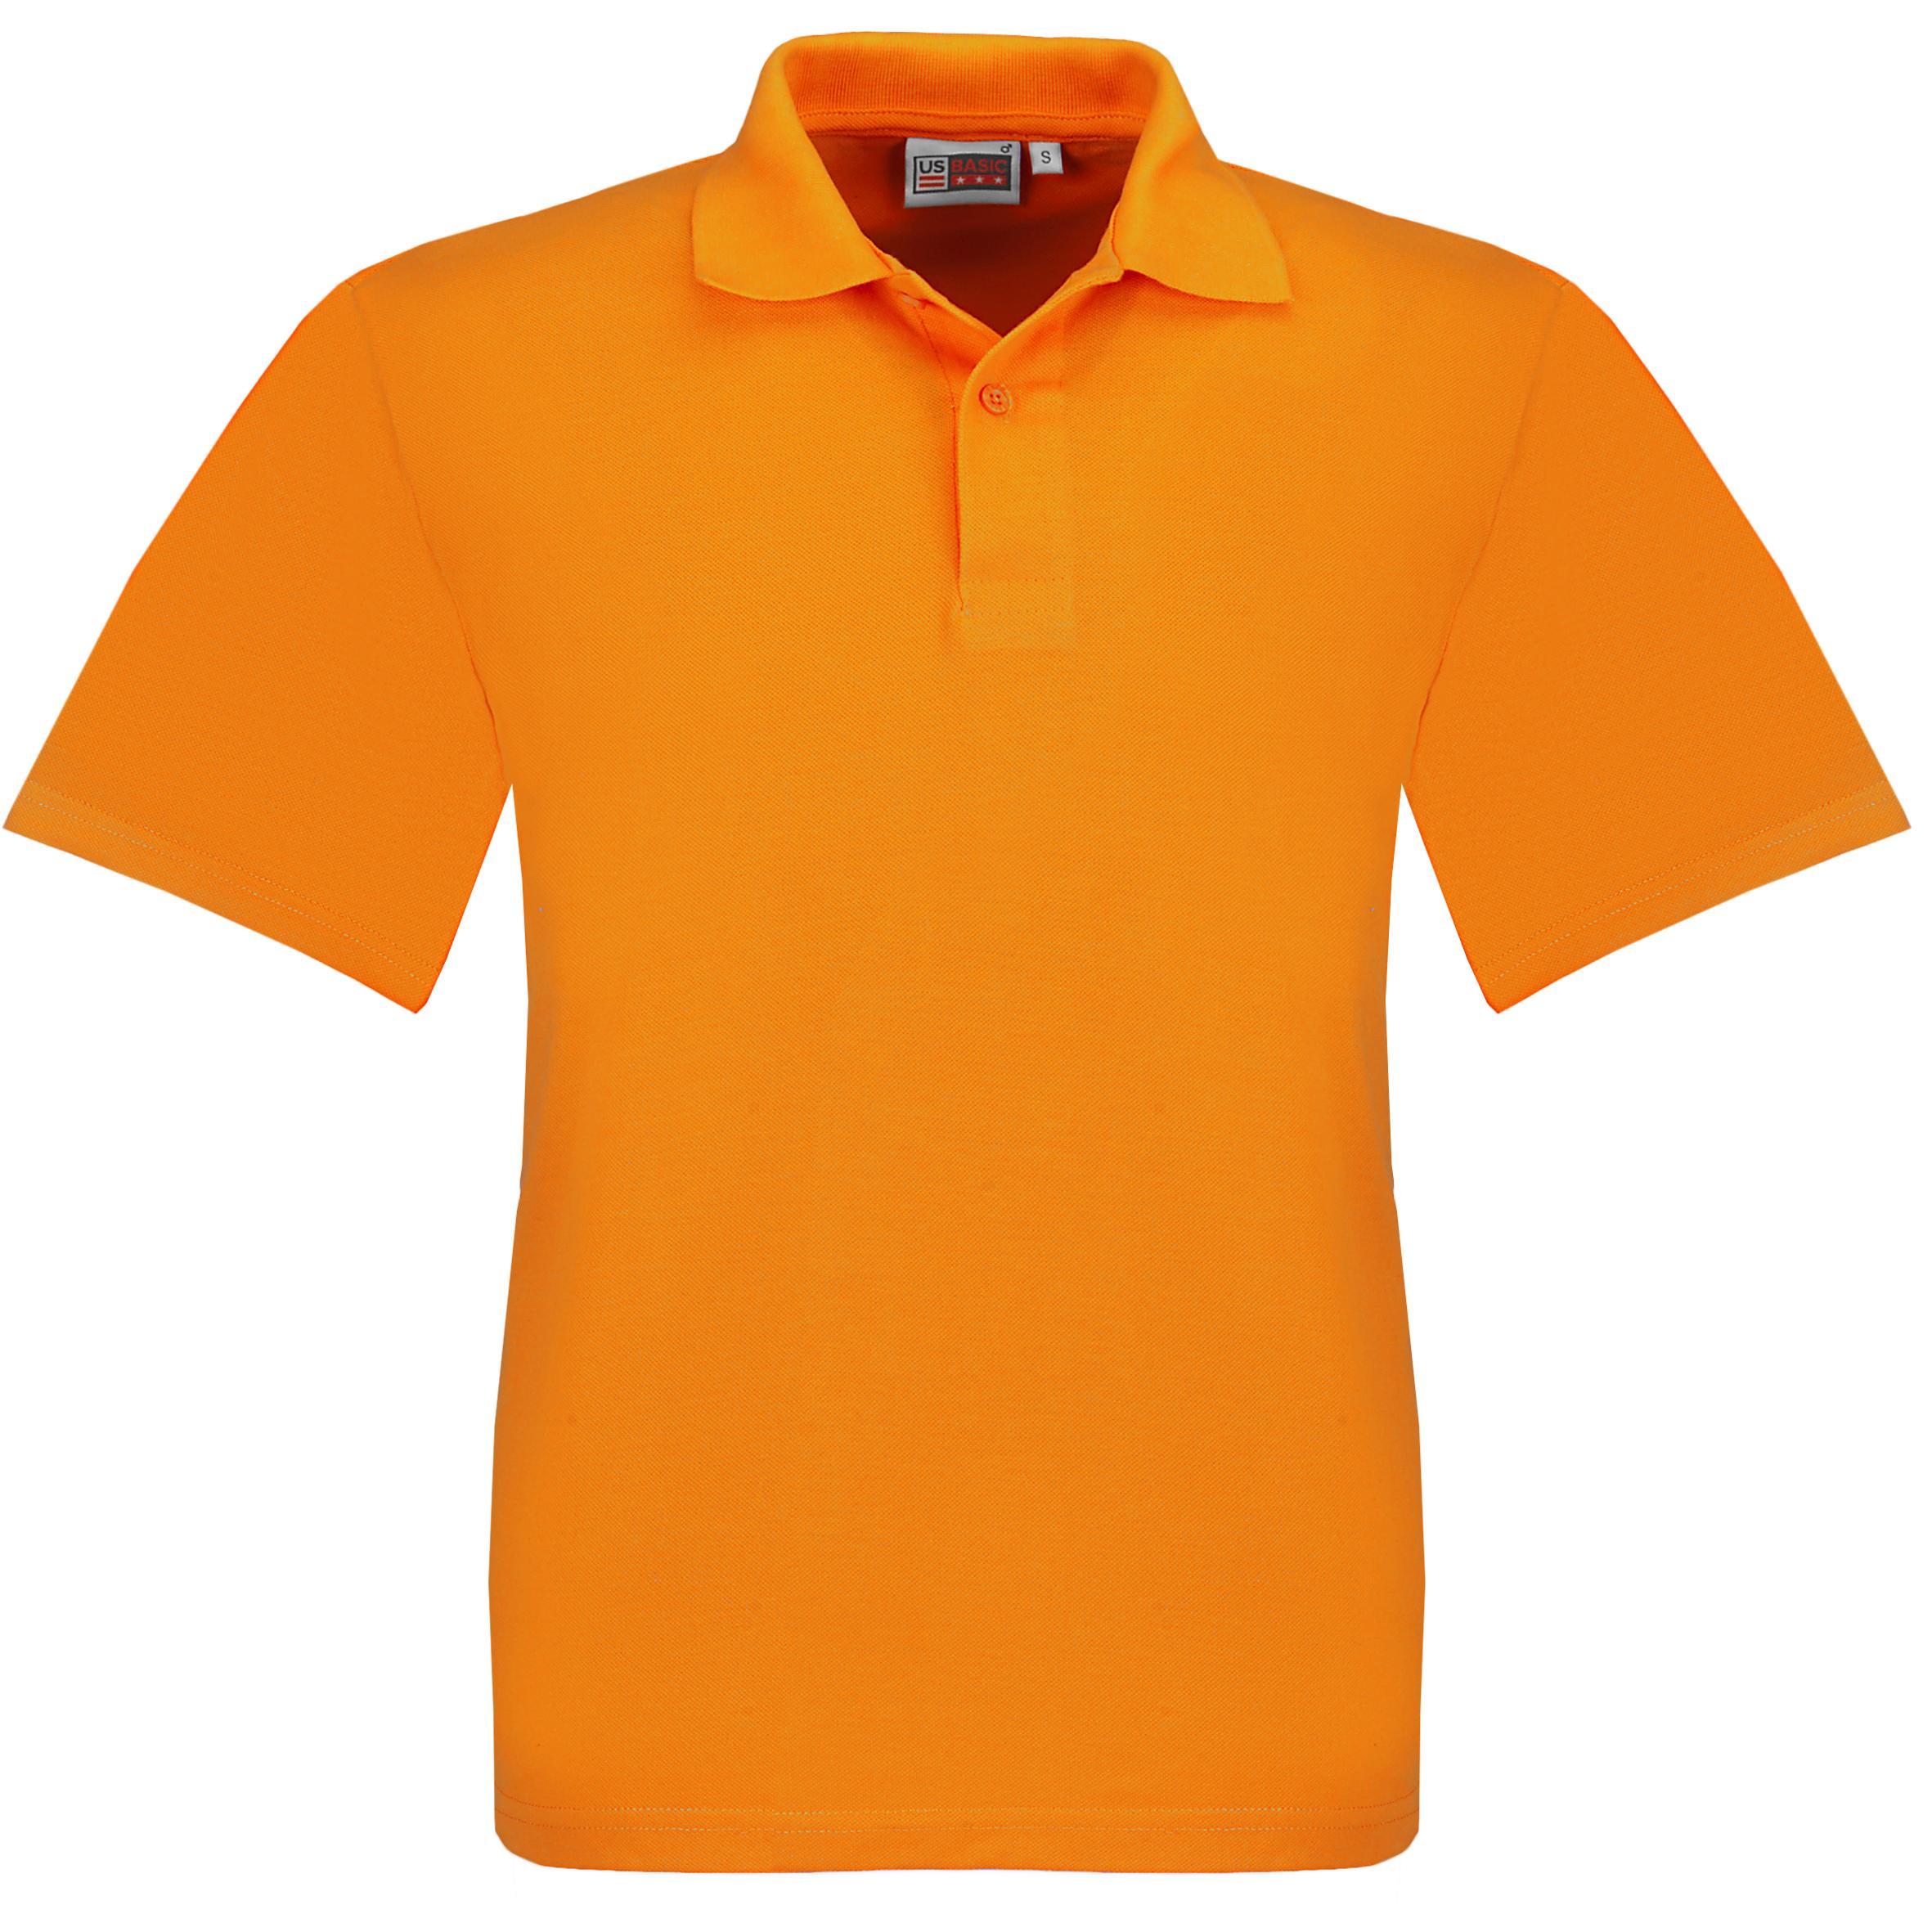 Kids Elemental Golf Shirt - Orange Only